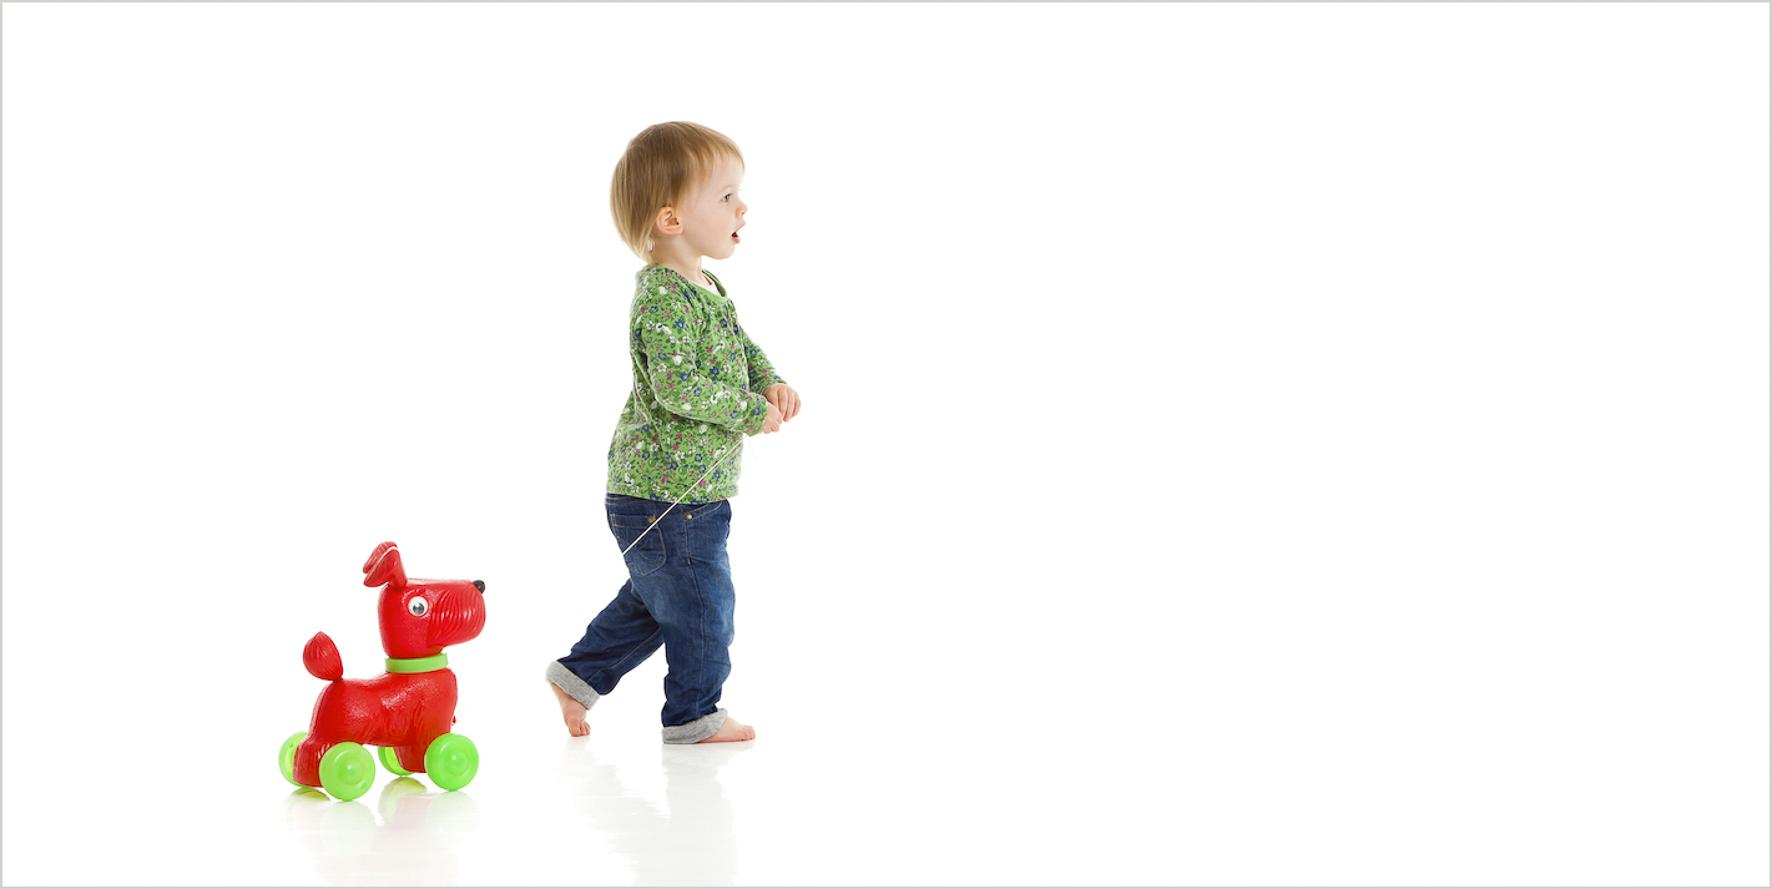 Kinderfotografie im Studio niedlich mit Spielzeug